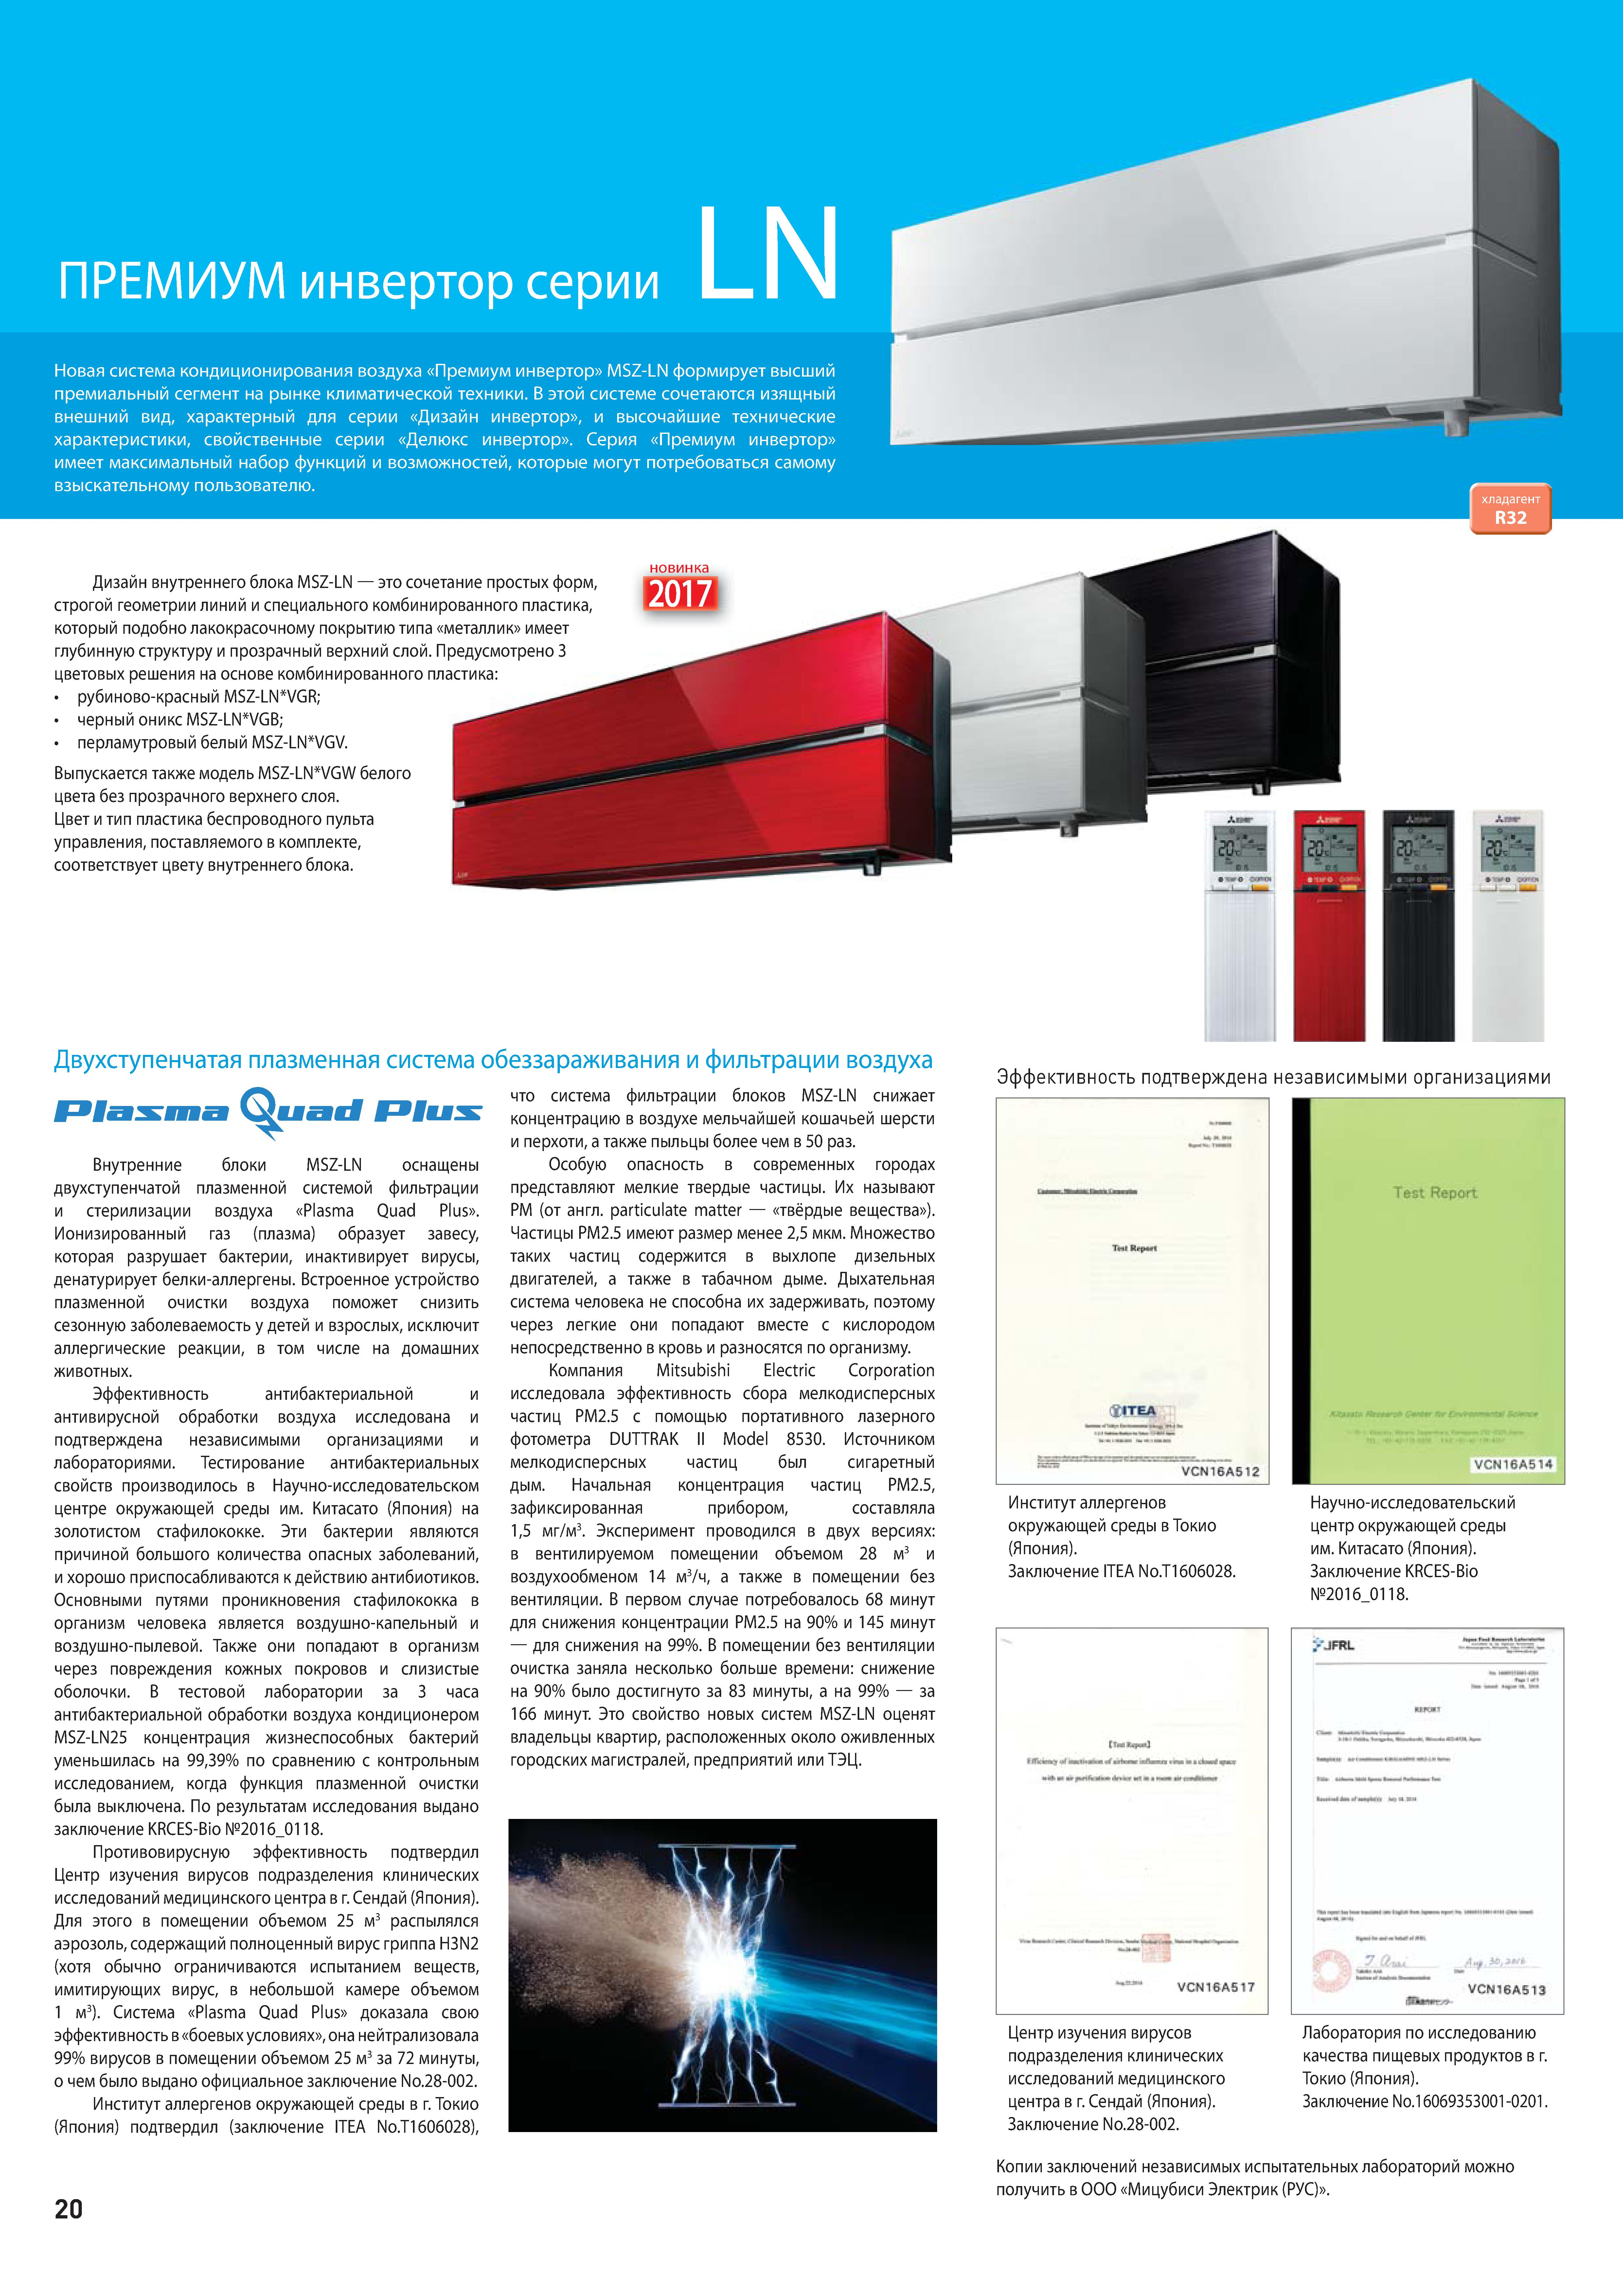 http://mitsubishi-electric-russia.ru/image/catalog/ сплиты/MSZ-ln /Page_00022